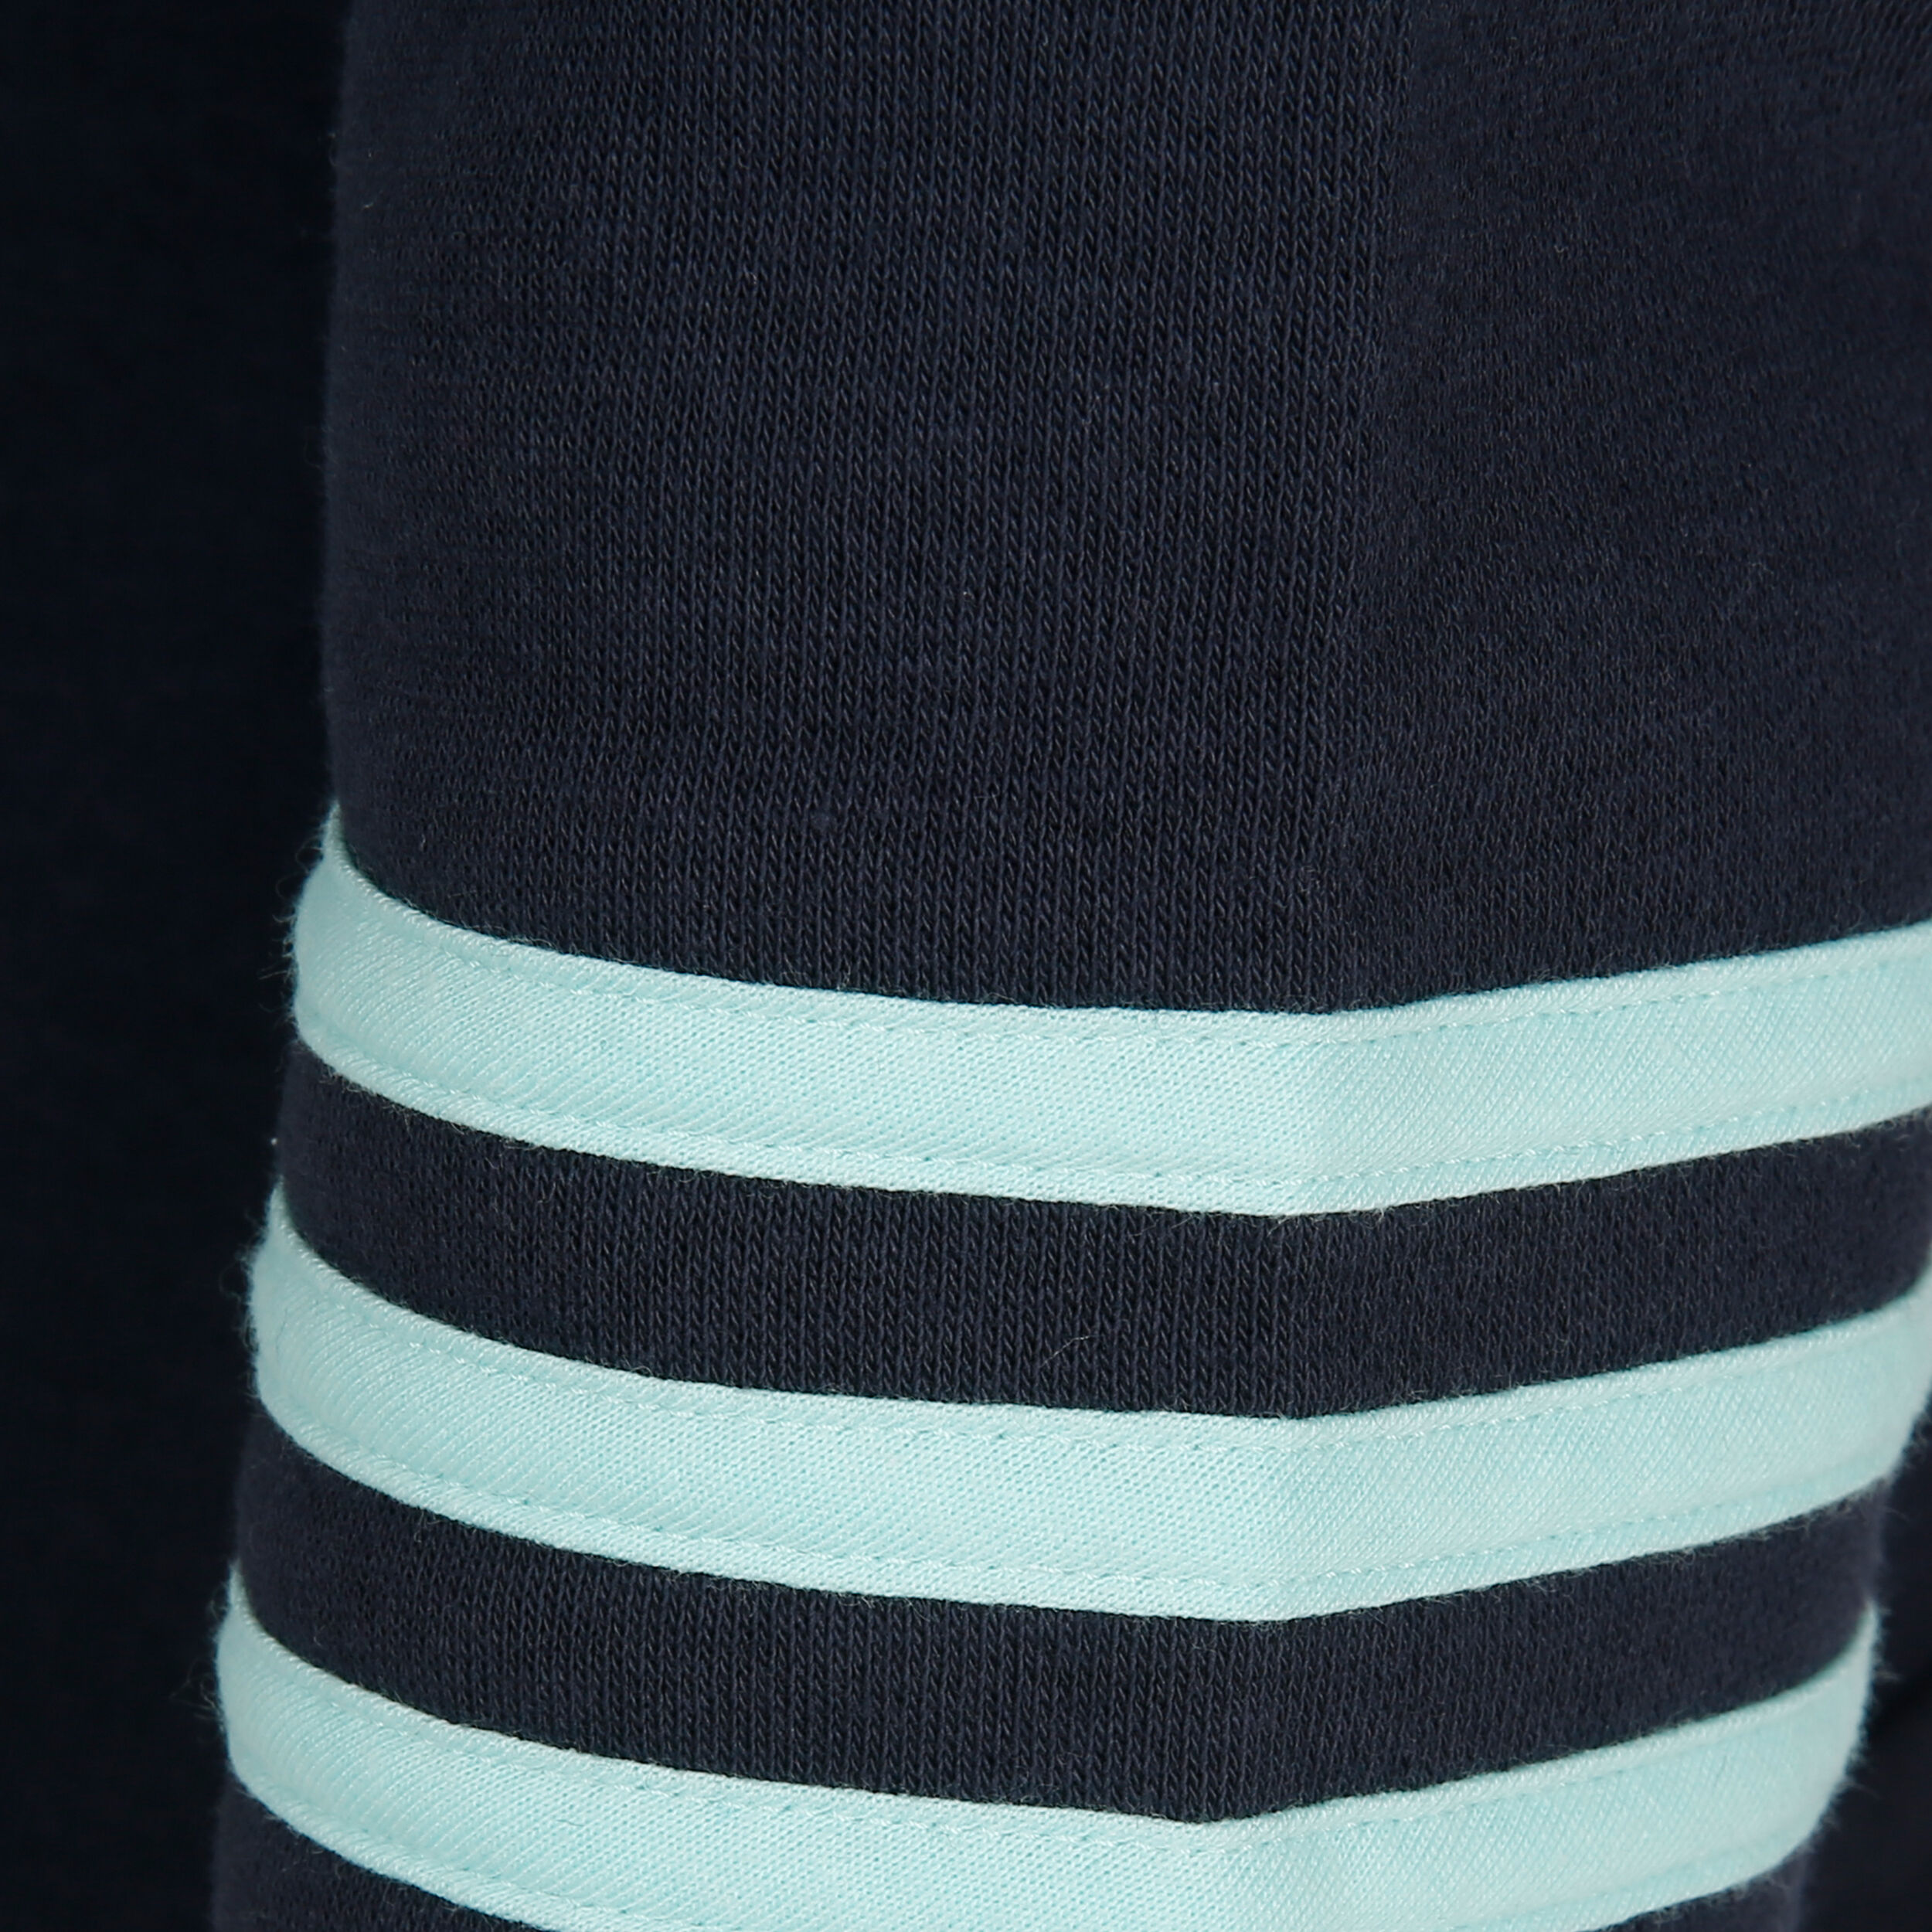 adidas Cotton Energizer Chándal Mujeres Azul Oscuro, Mint